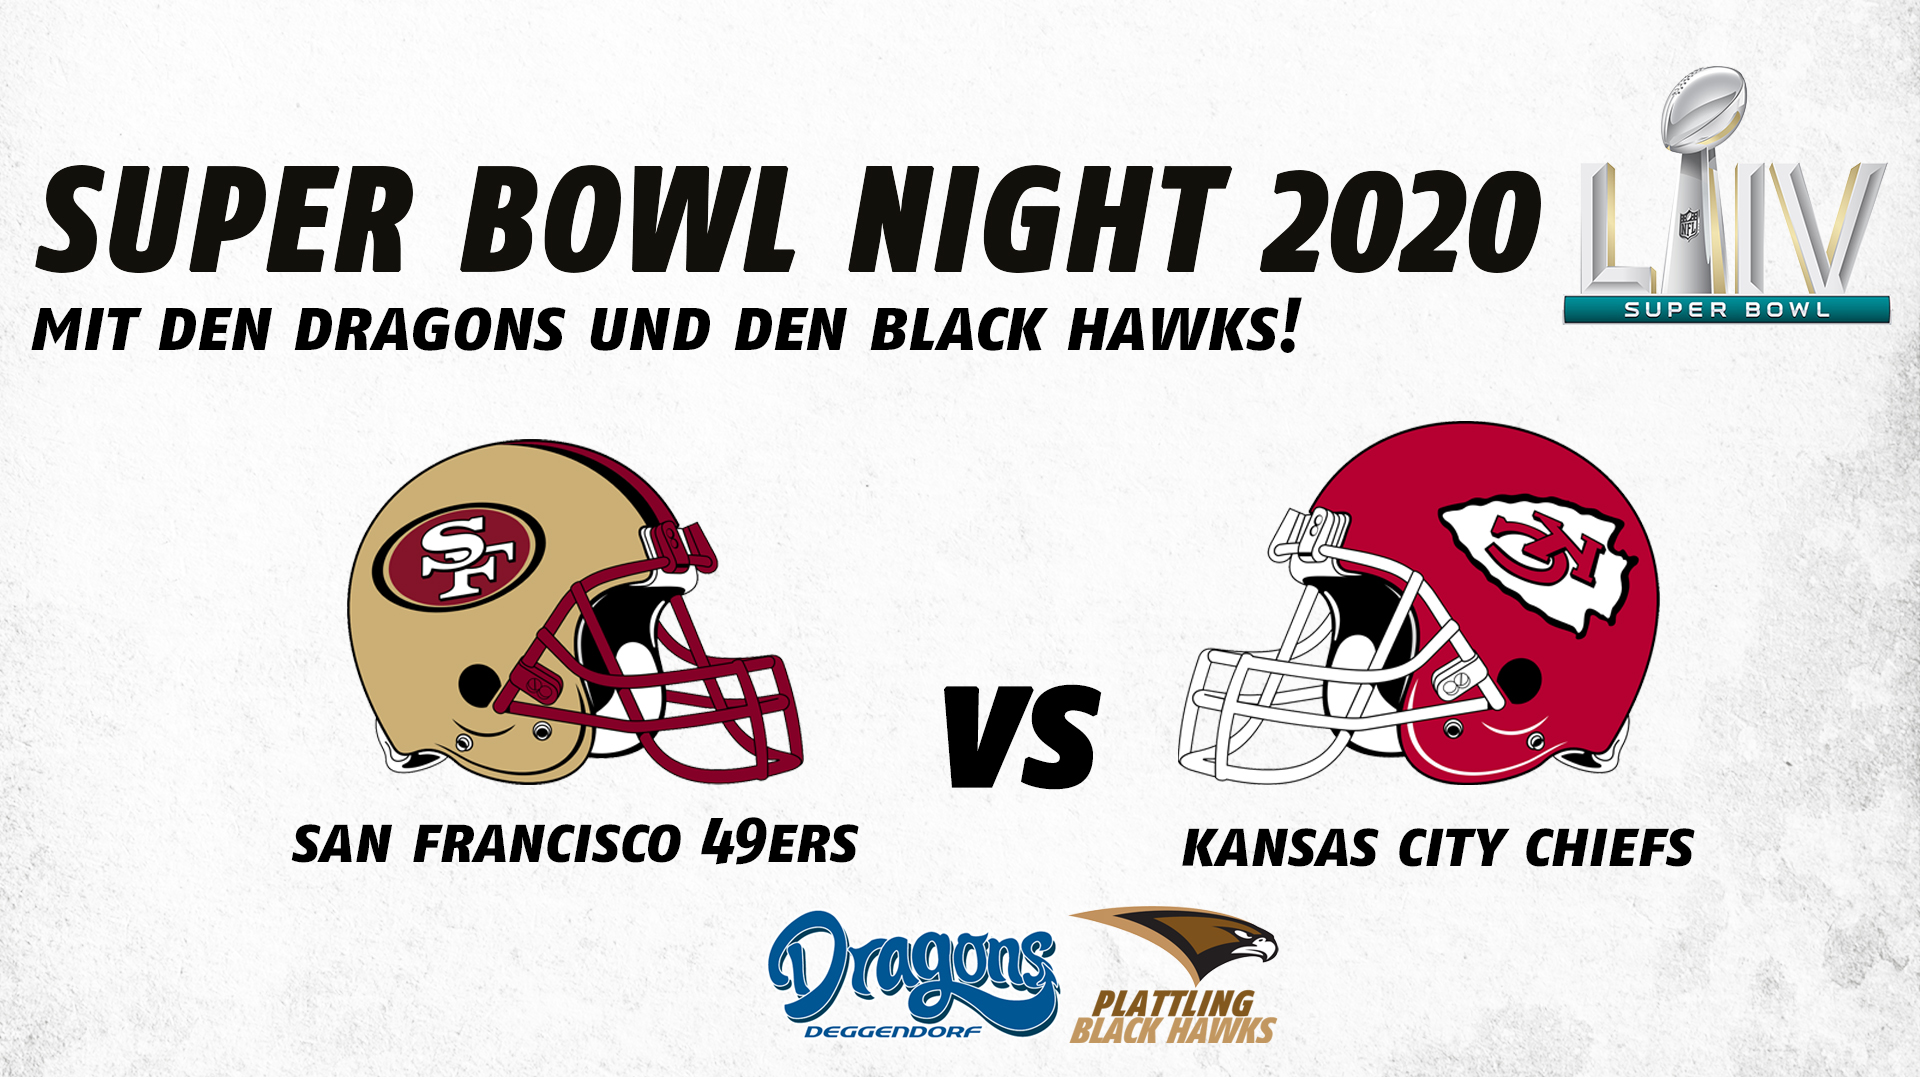 Super Bowl Night 2020 – Mit den Deggendorf Dragons